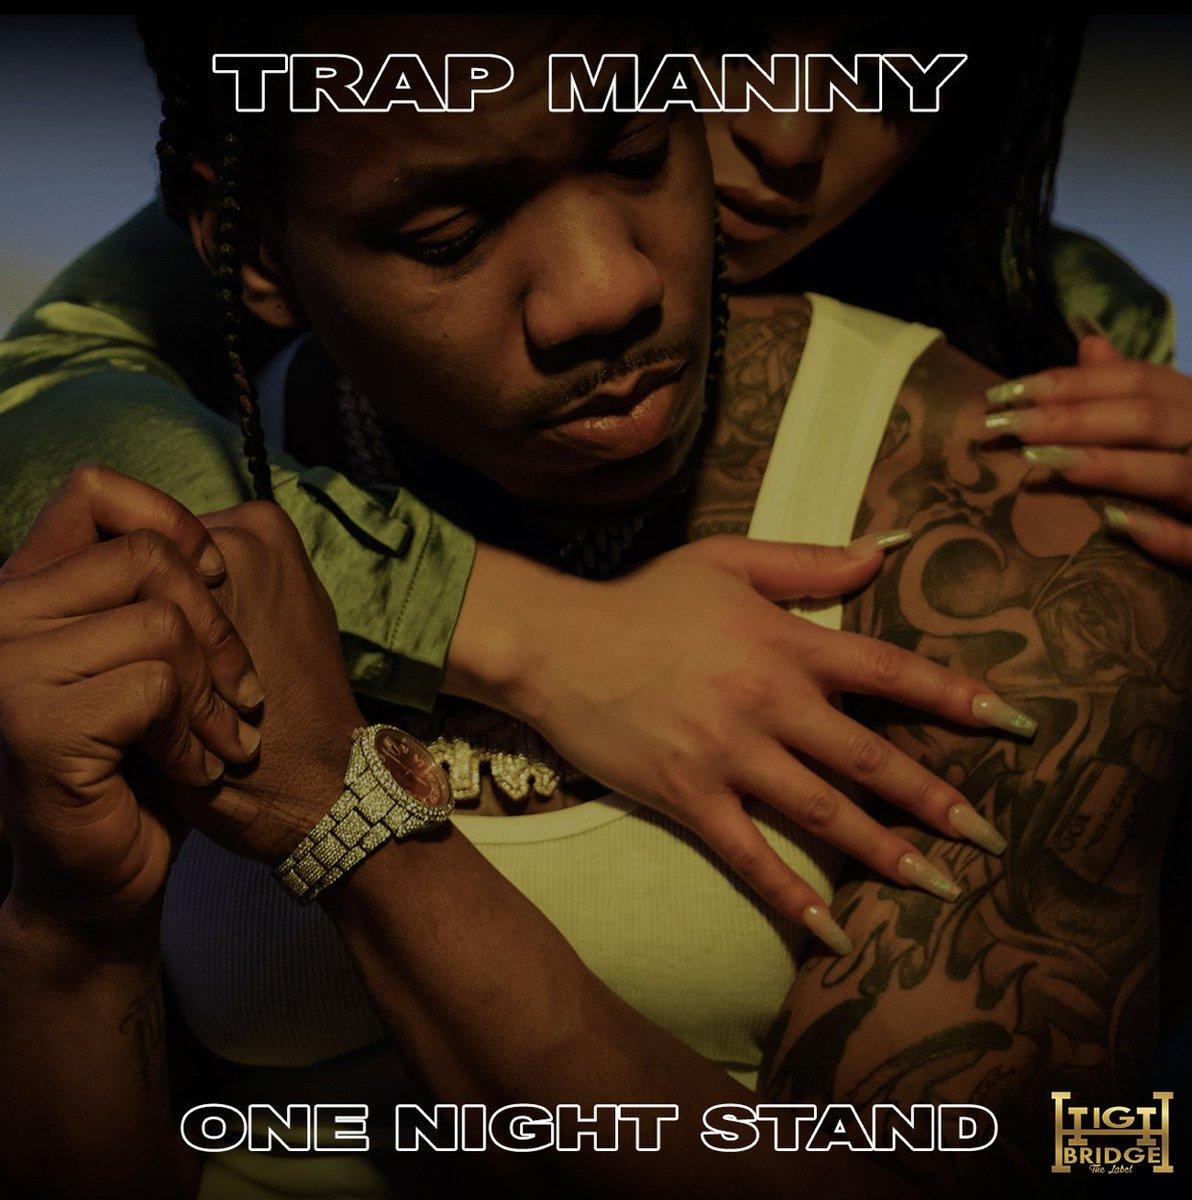 New @trapmannyhbtl19 #HBTL 🔥🔥🔥 trapmanny.lnk.to/OneNightStand